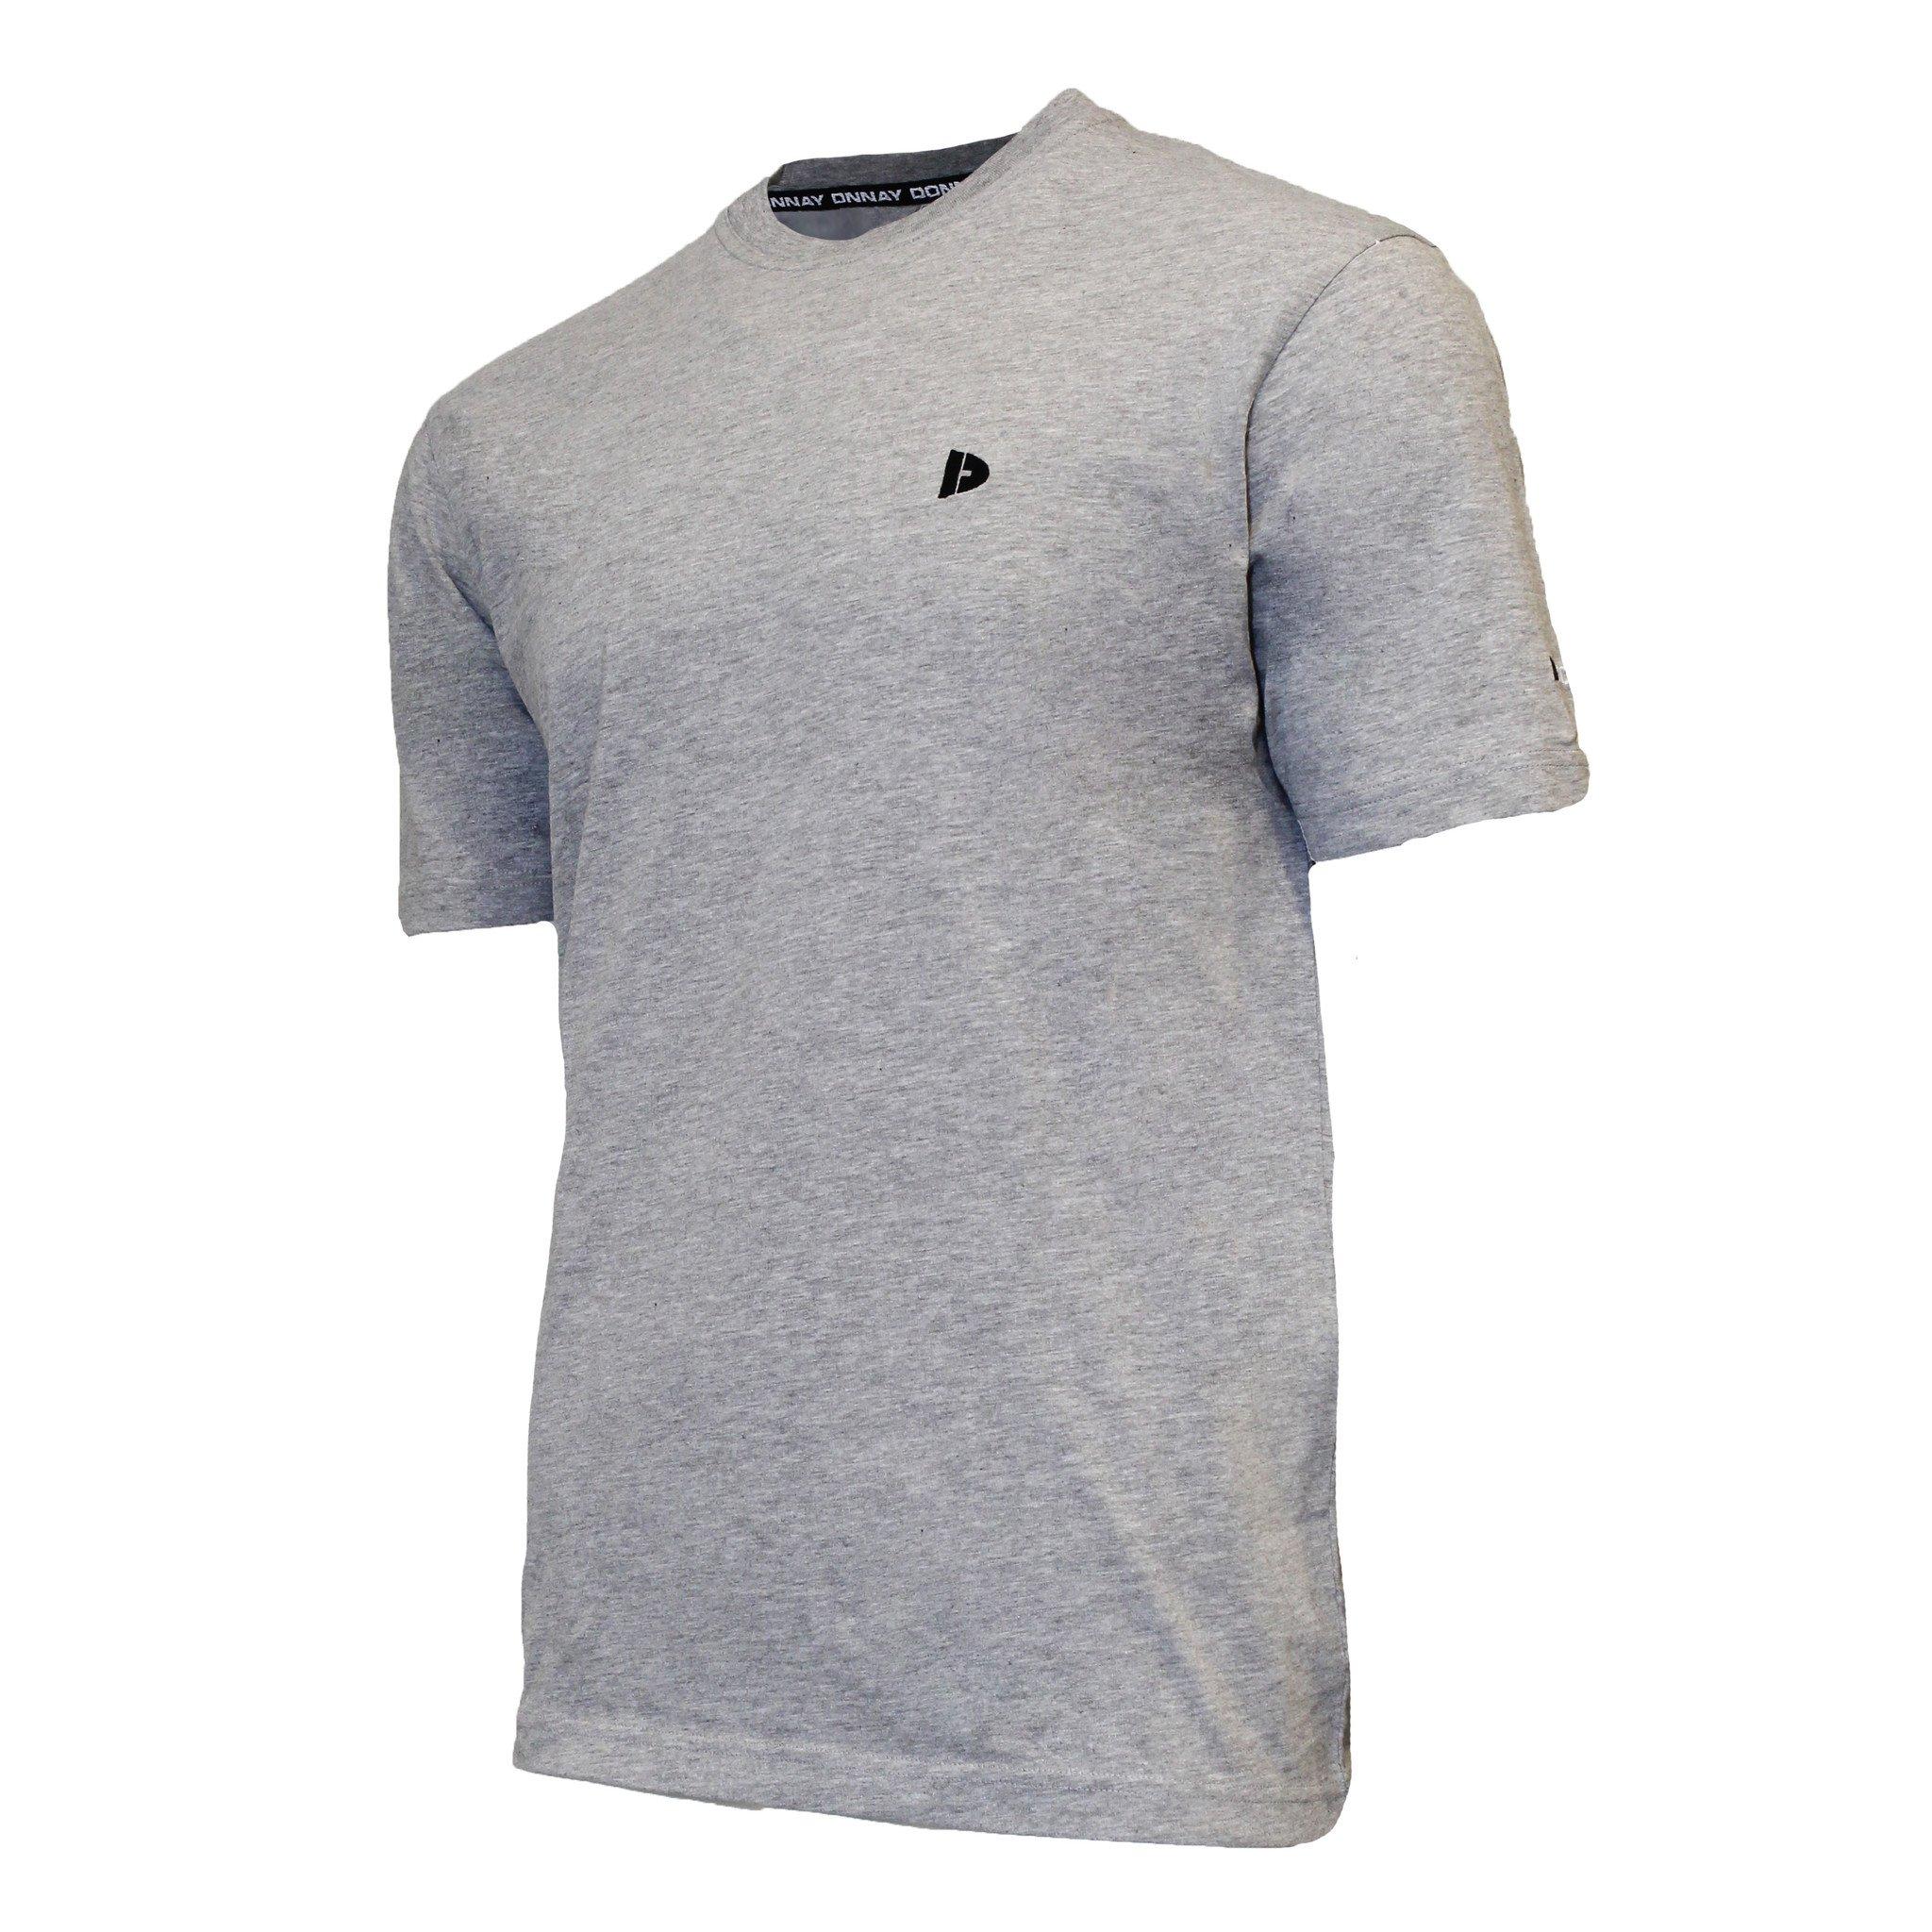 Donnay Donnay Heren - T-Shirt Vince - Lichtgrijs gemêleerd